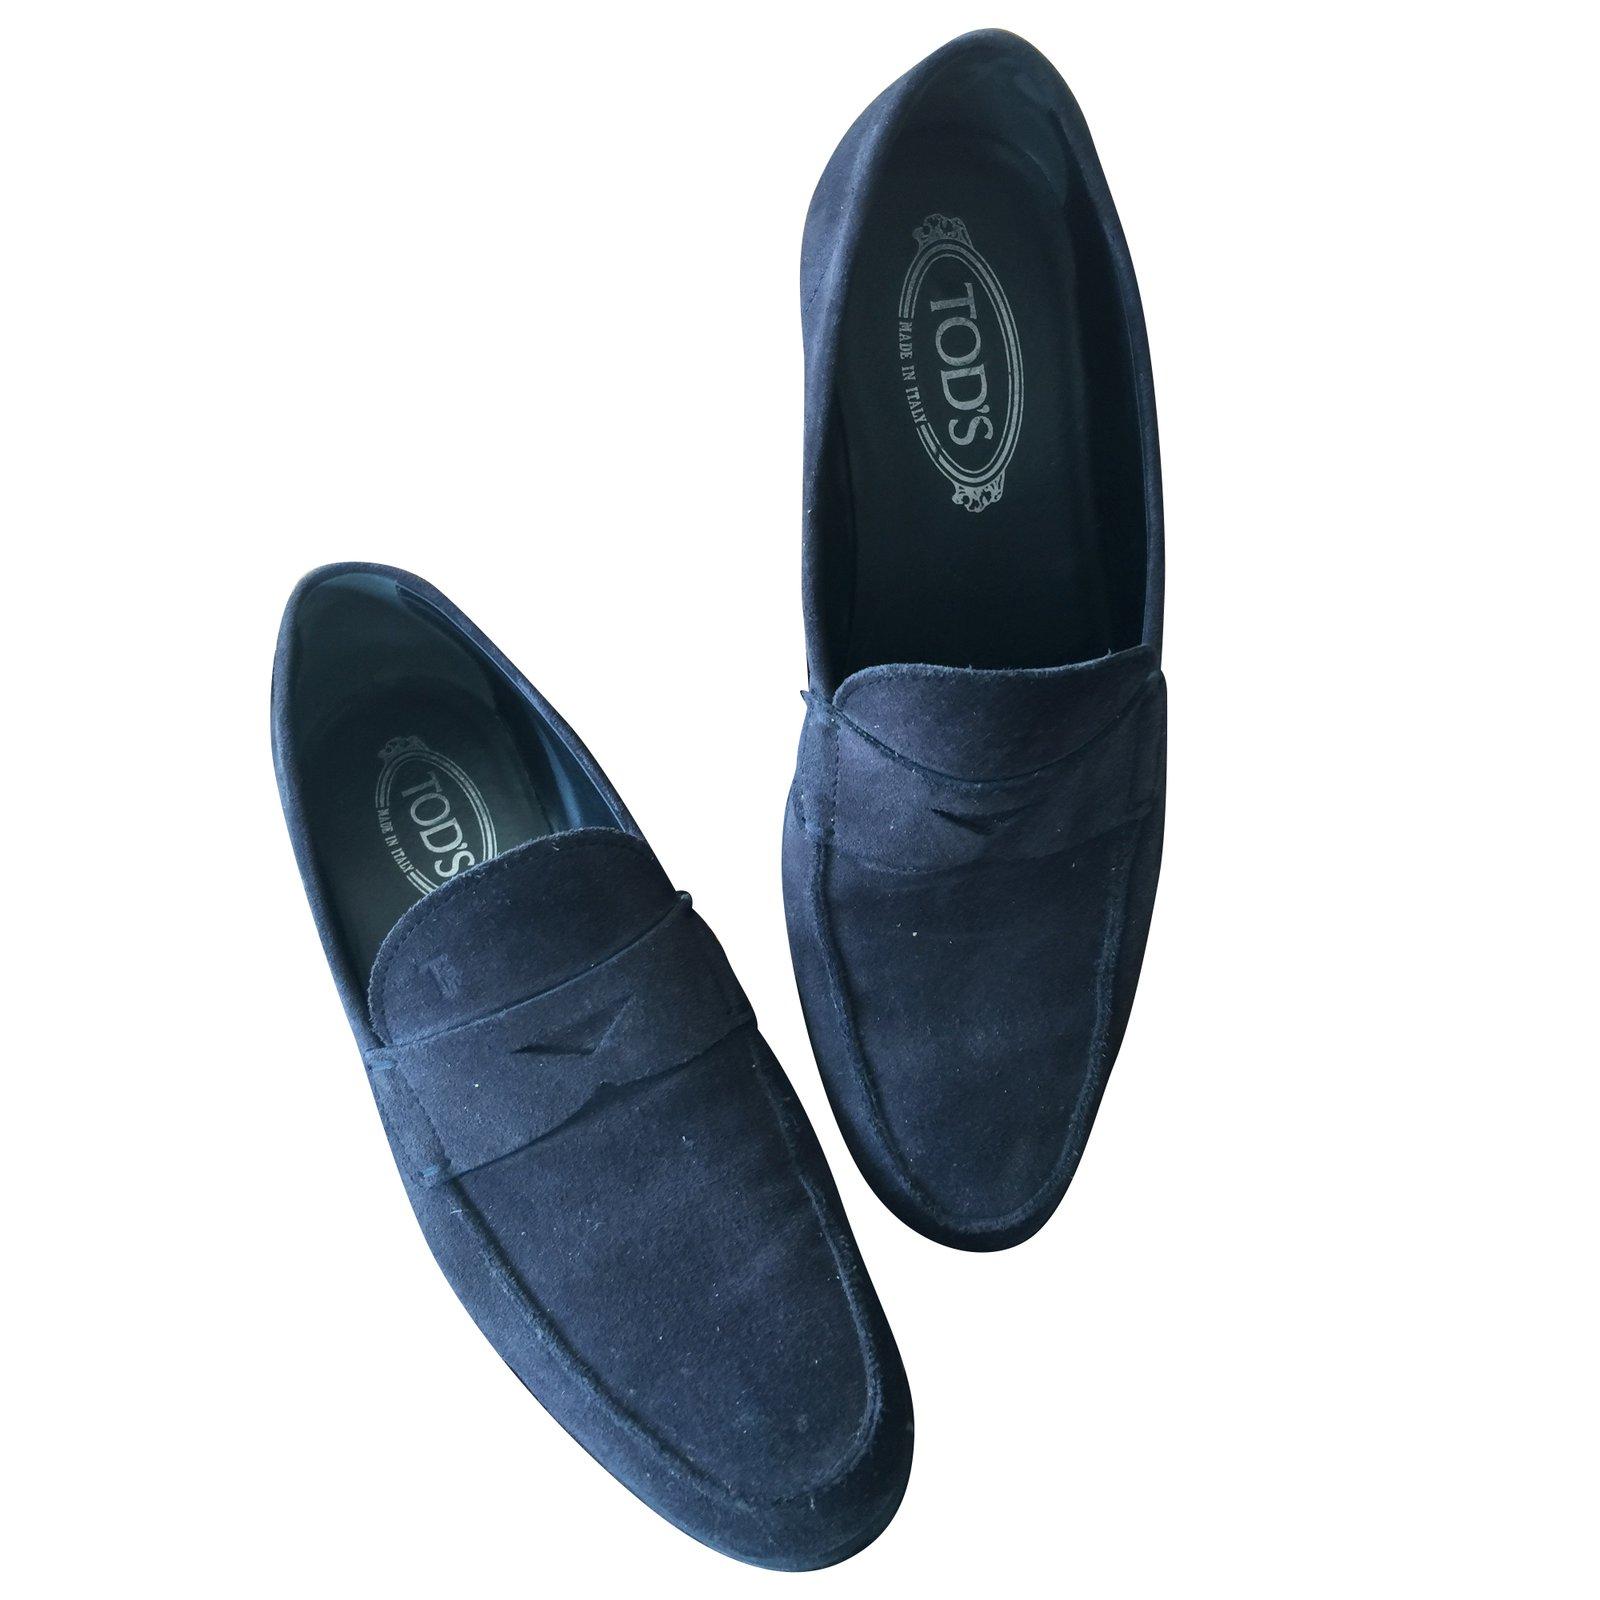 mocassins homme tod 39 s mocassins homme daim bleu marine joli closet. Black Bedroom Furniture Sets. Home Design Ideas